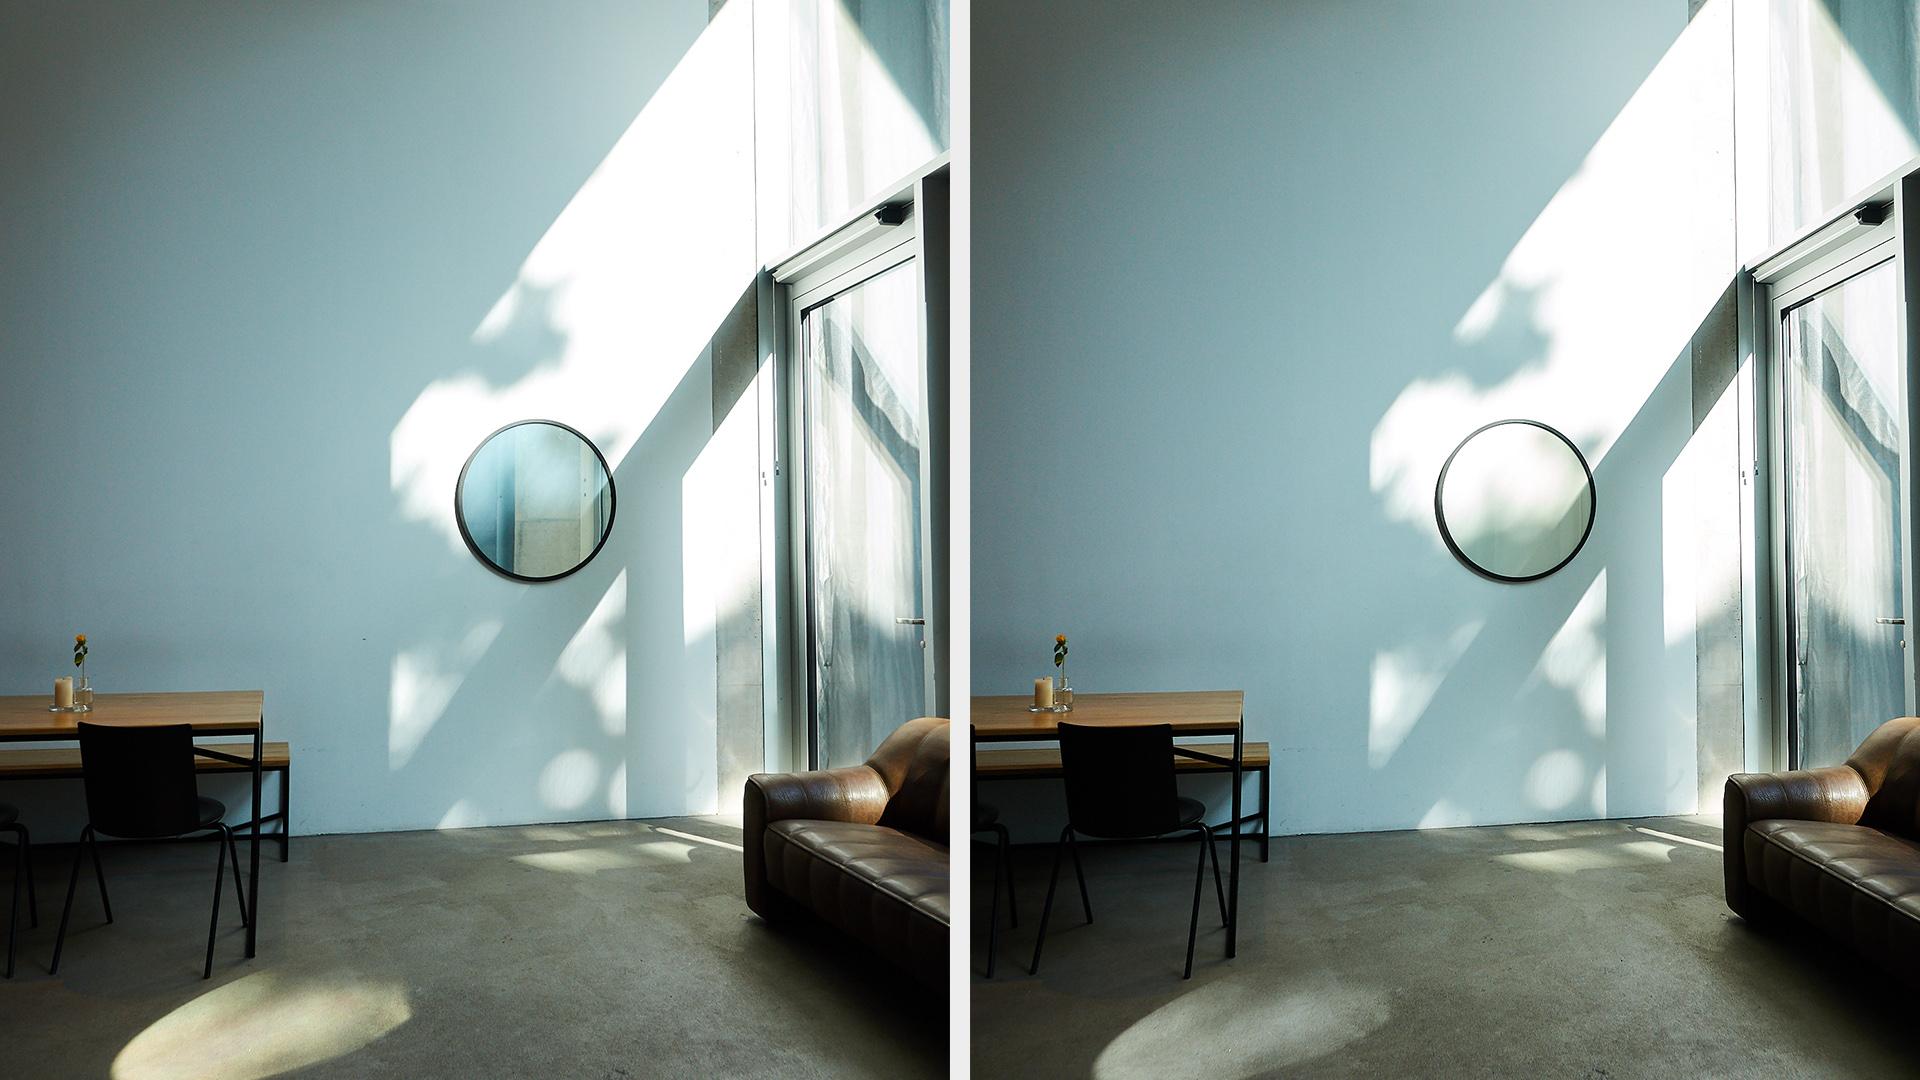 rlon-pranayama-kinetic-art-installation-opener.jpg